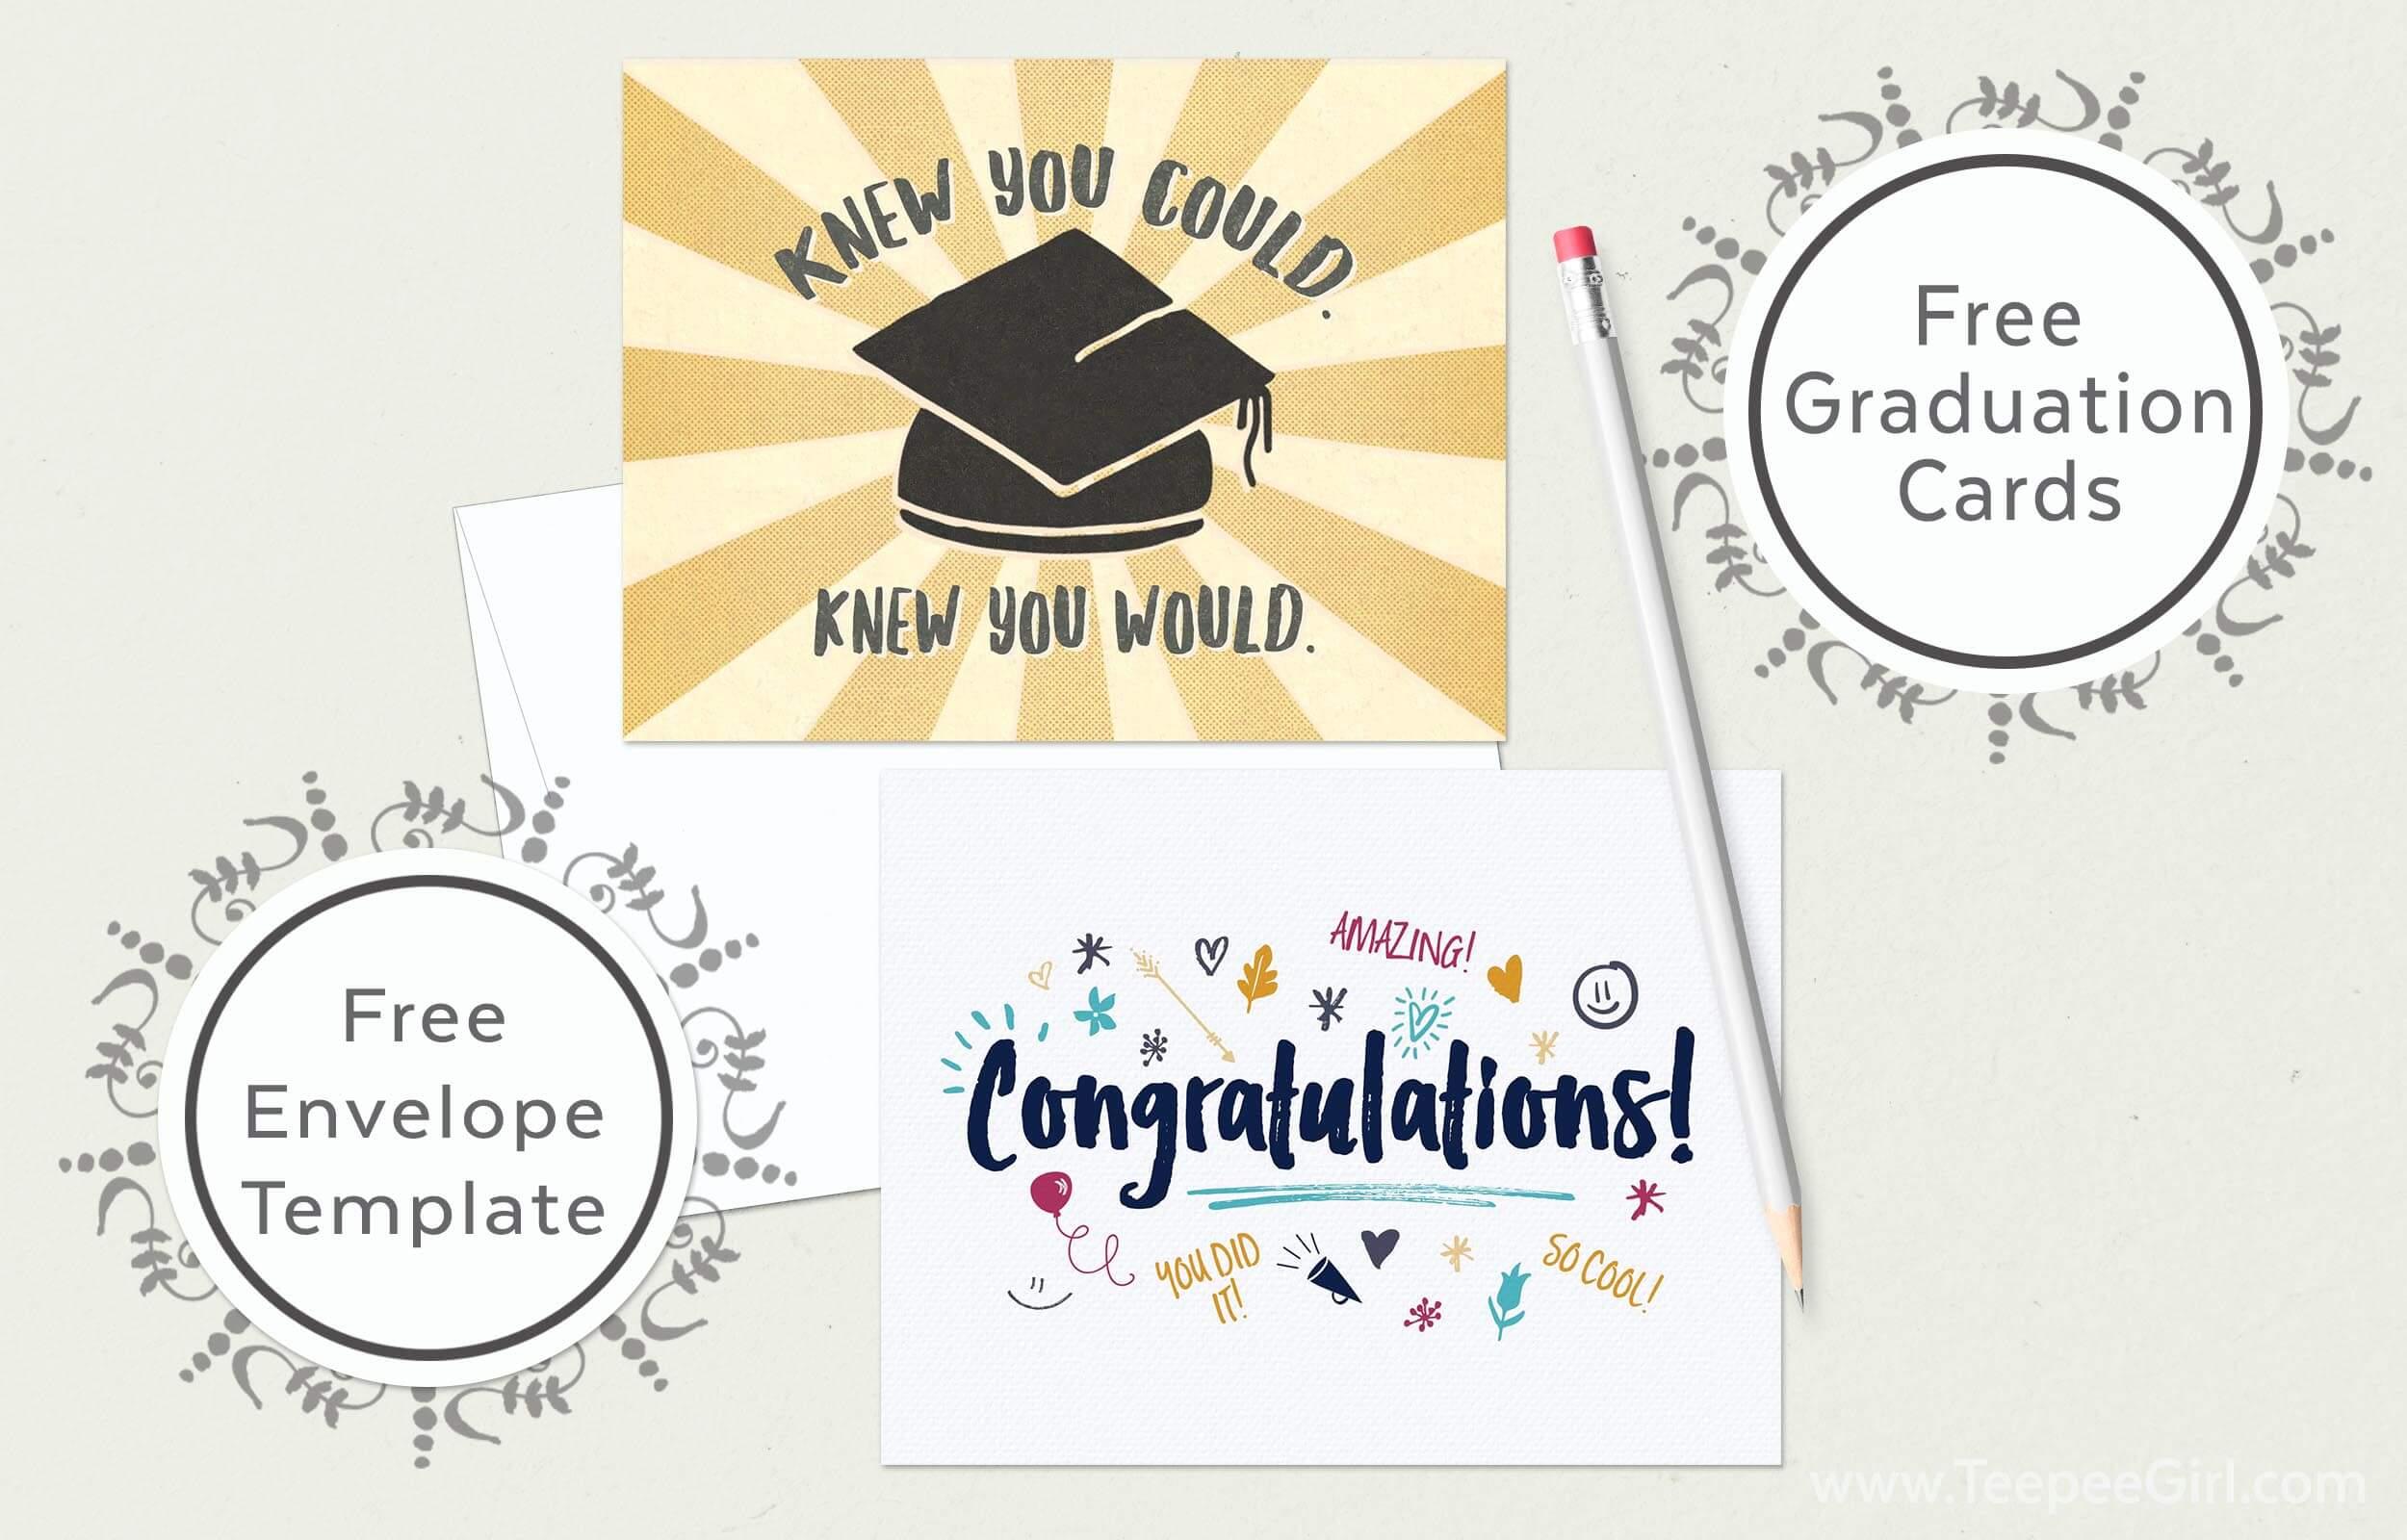 Free Graduation Cards Envelope Template Www Teepeegirl Com